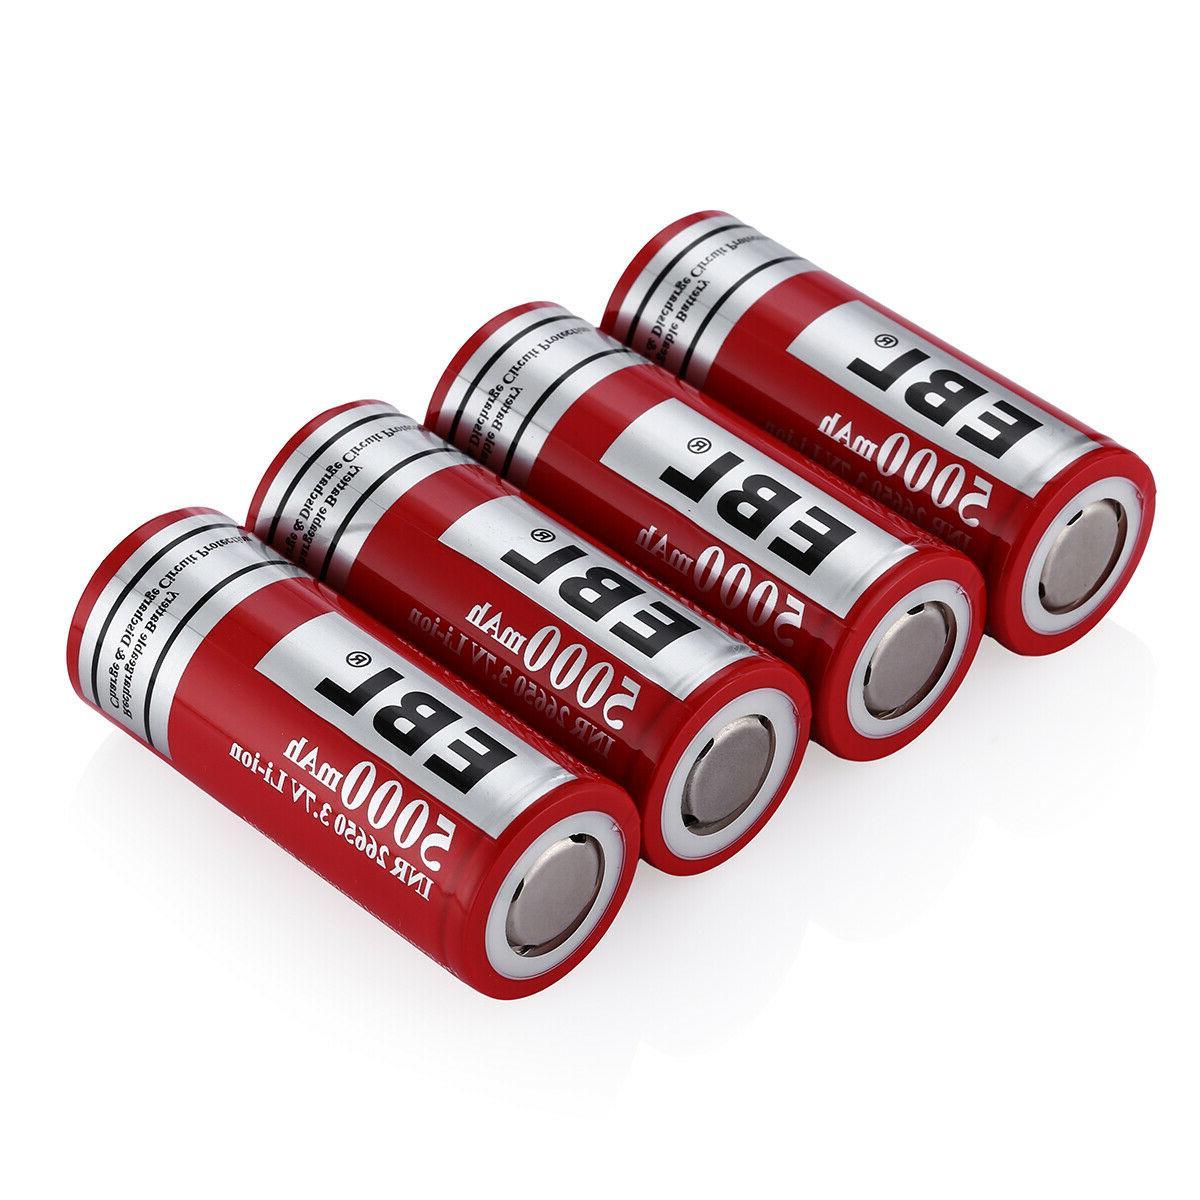 4 Battery Li-ion Drain LED Toy